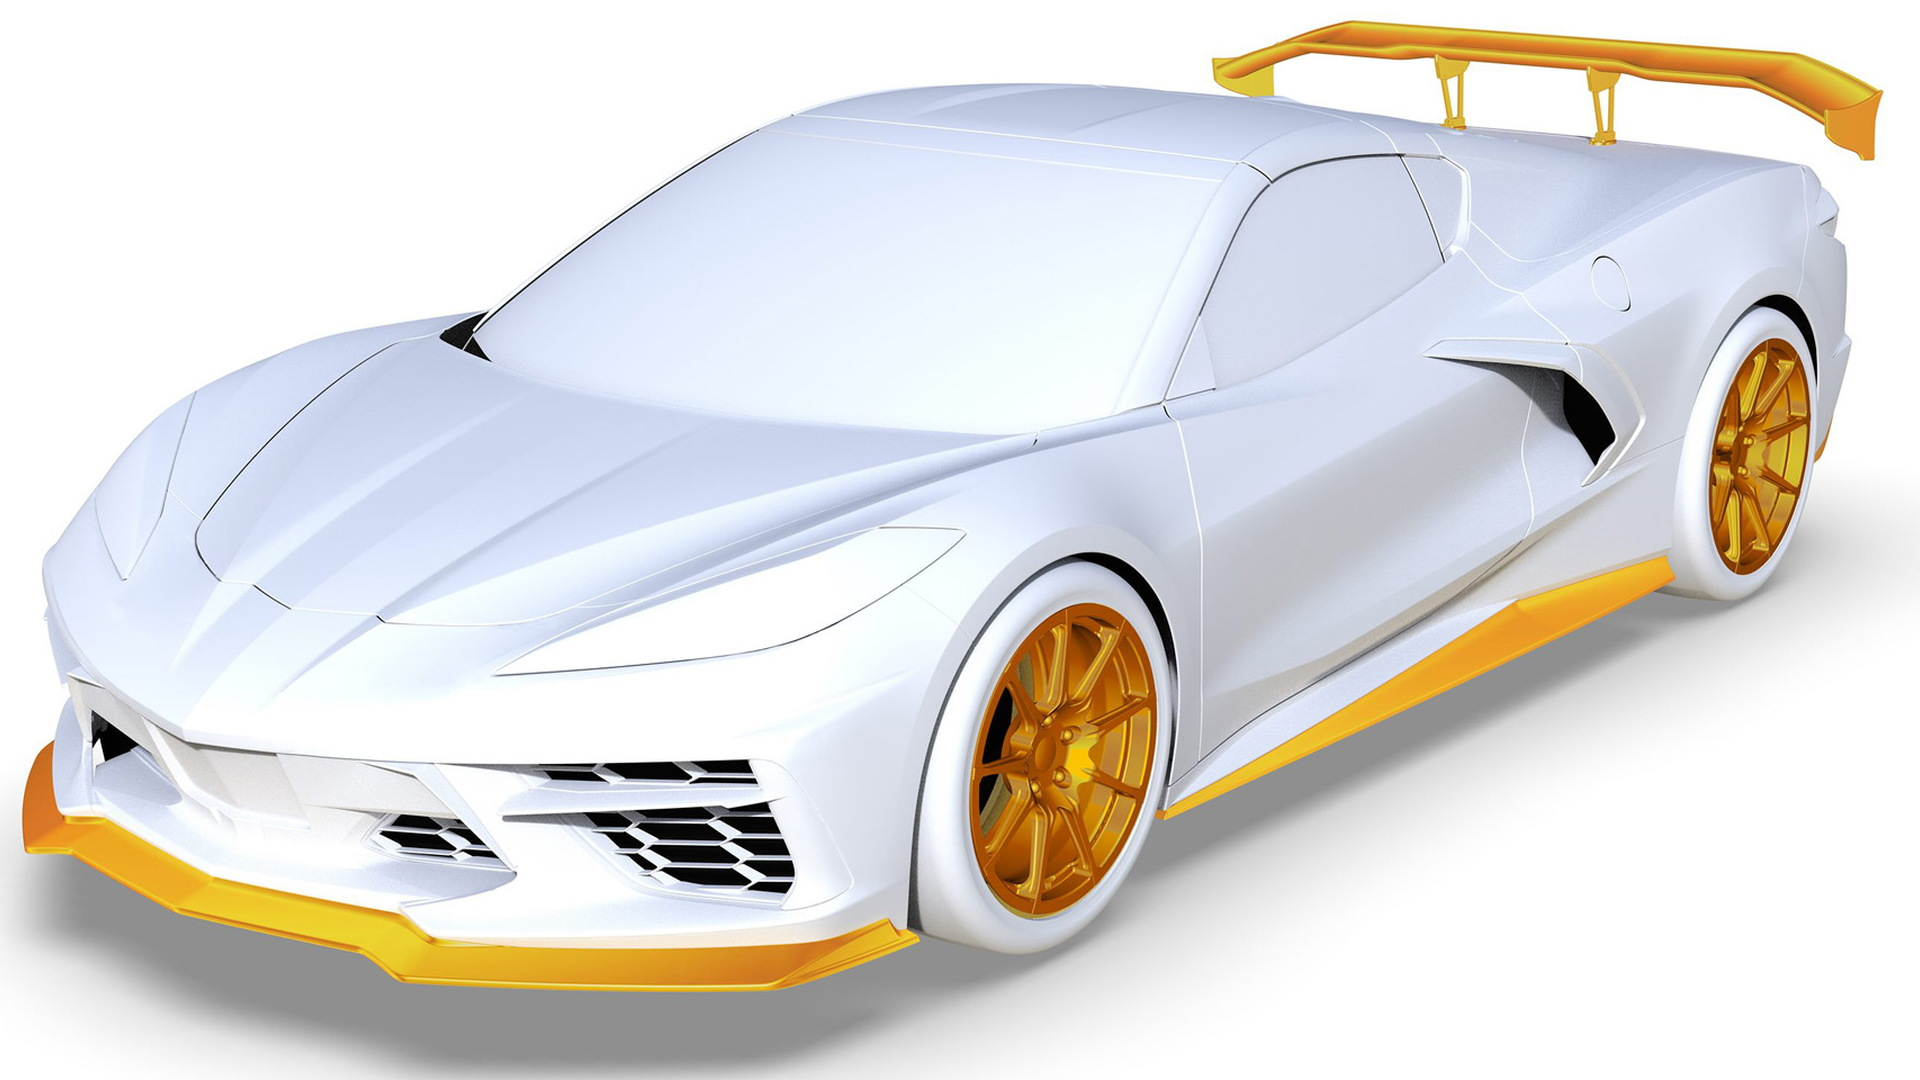 Teaser for 2021 Callaway Corvette Launch Edition